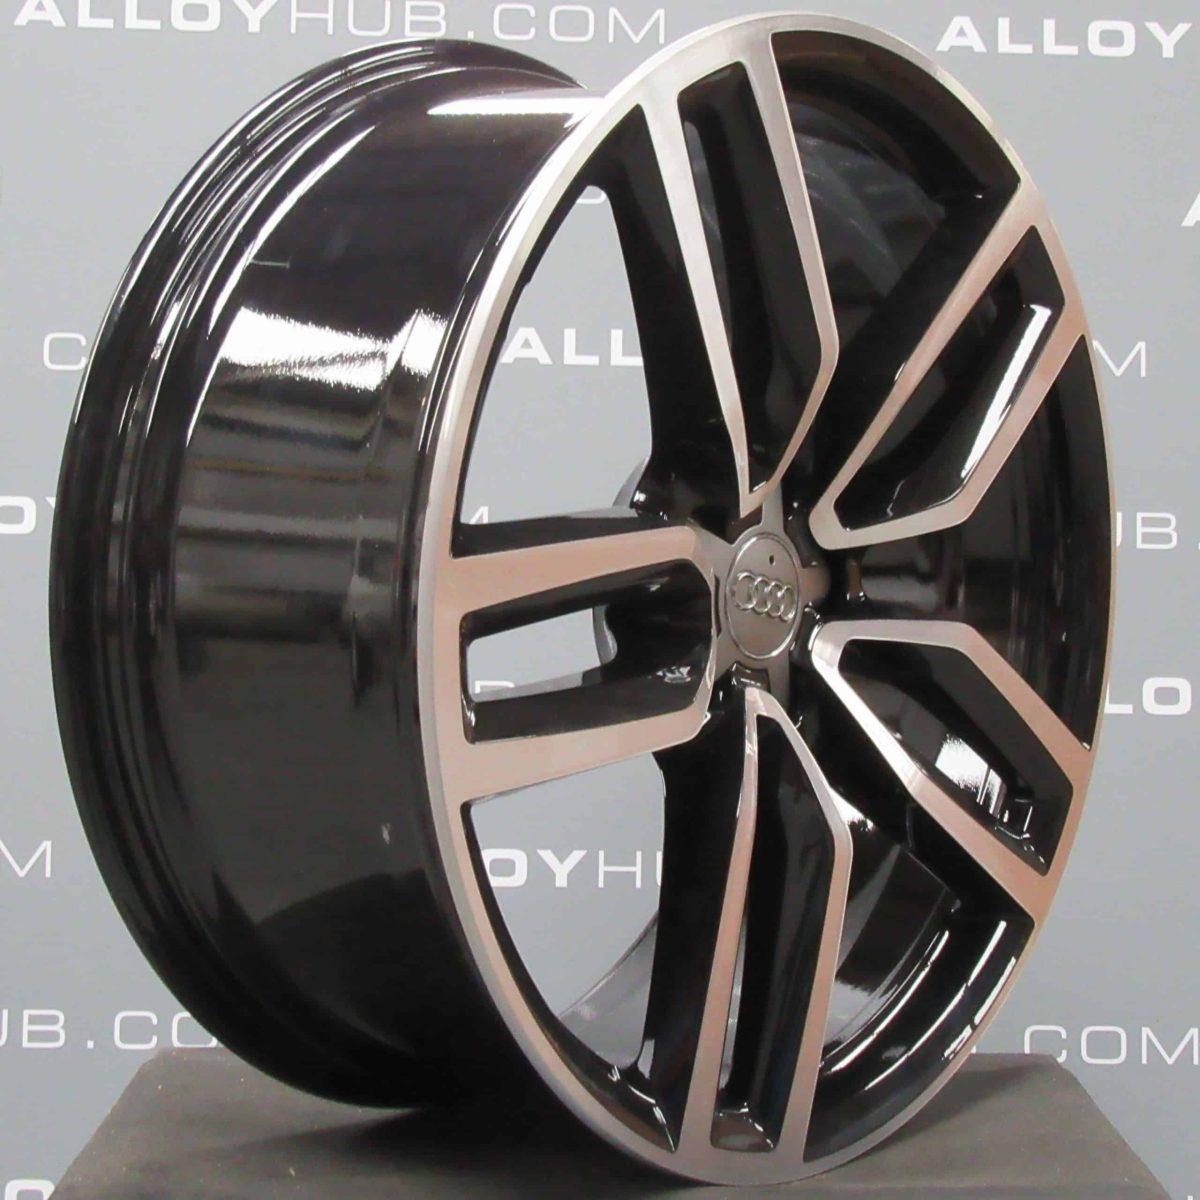 "Genuine Audi Q5 SQ5 8R 5 Twin Spoke 21"" Inch Alloy Wheels with Gloss Black & Diamond Turned Finish 8R0 601 025 CP"